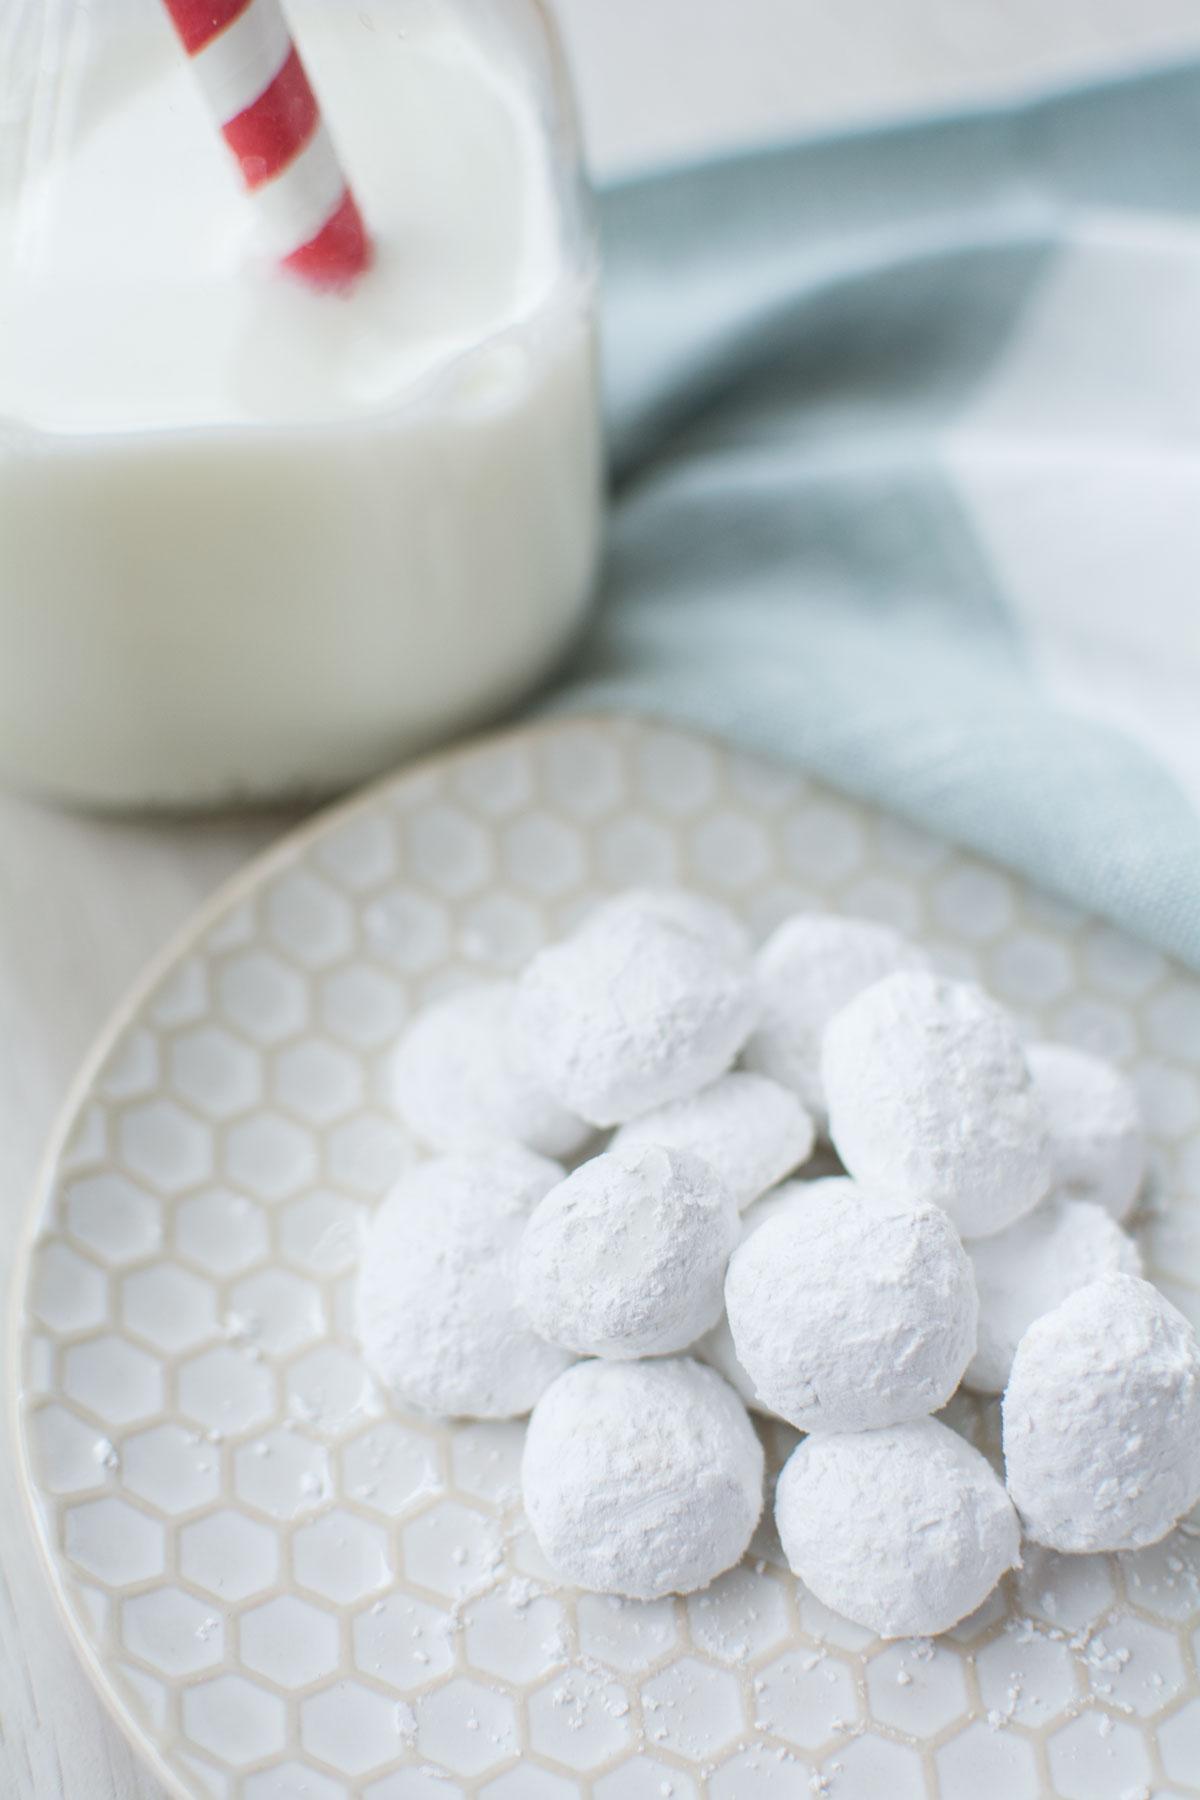 Ingredients: Flour, Butter, Sugar, Pecans, Dextrose, Salt, Natural Flavor.